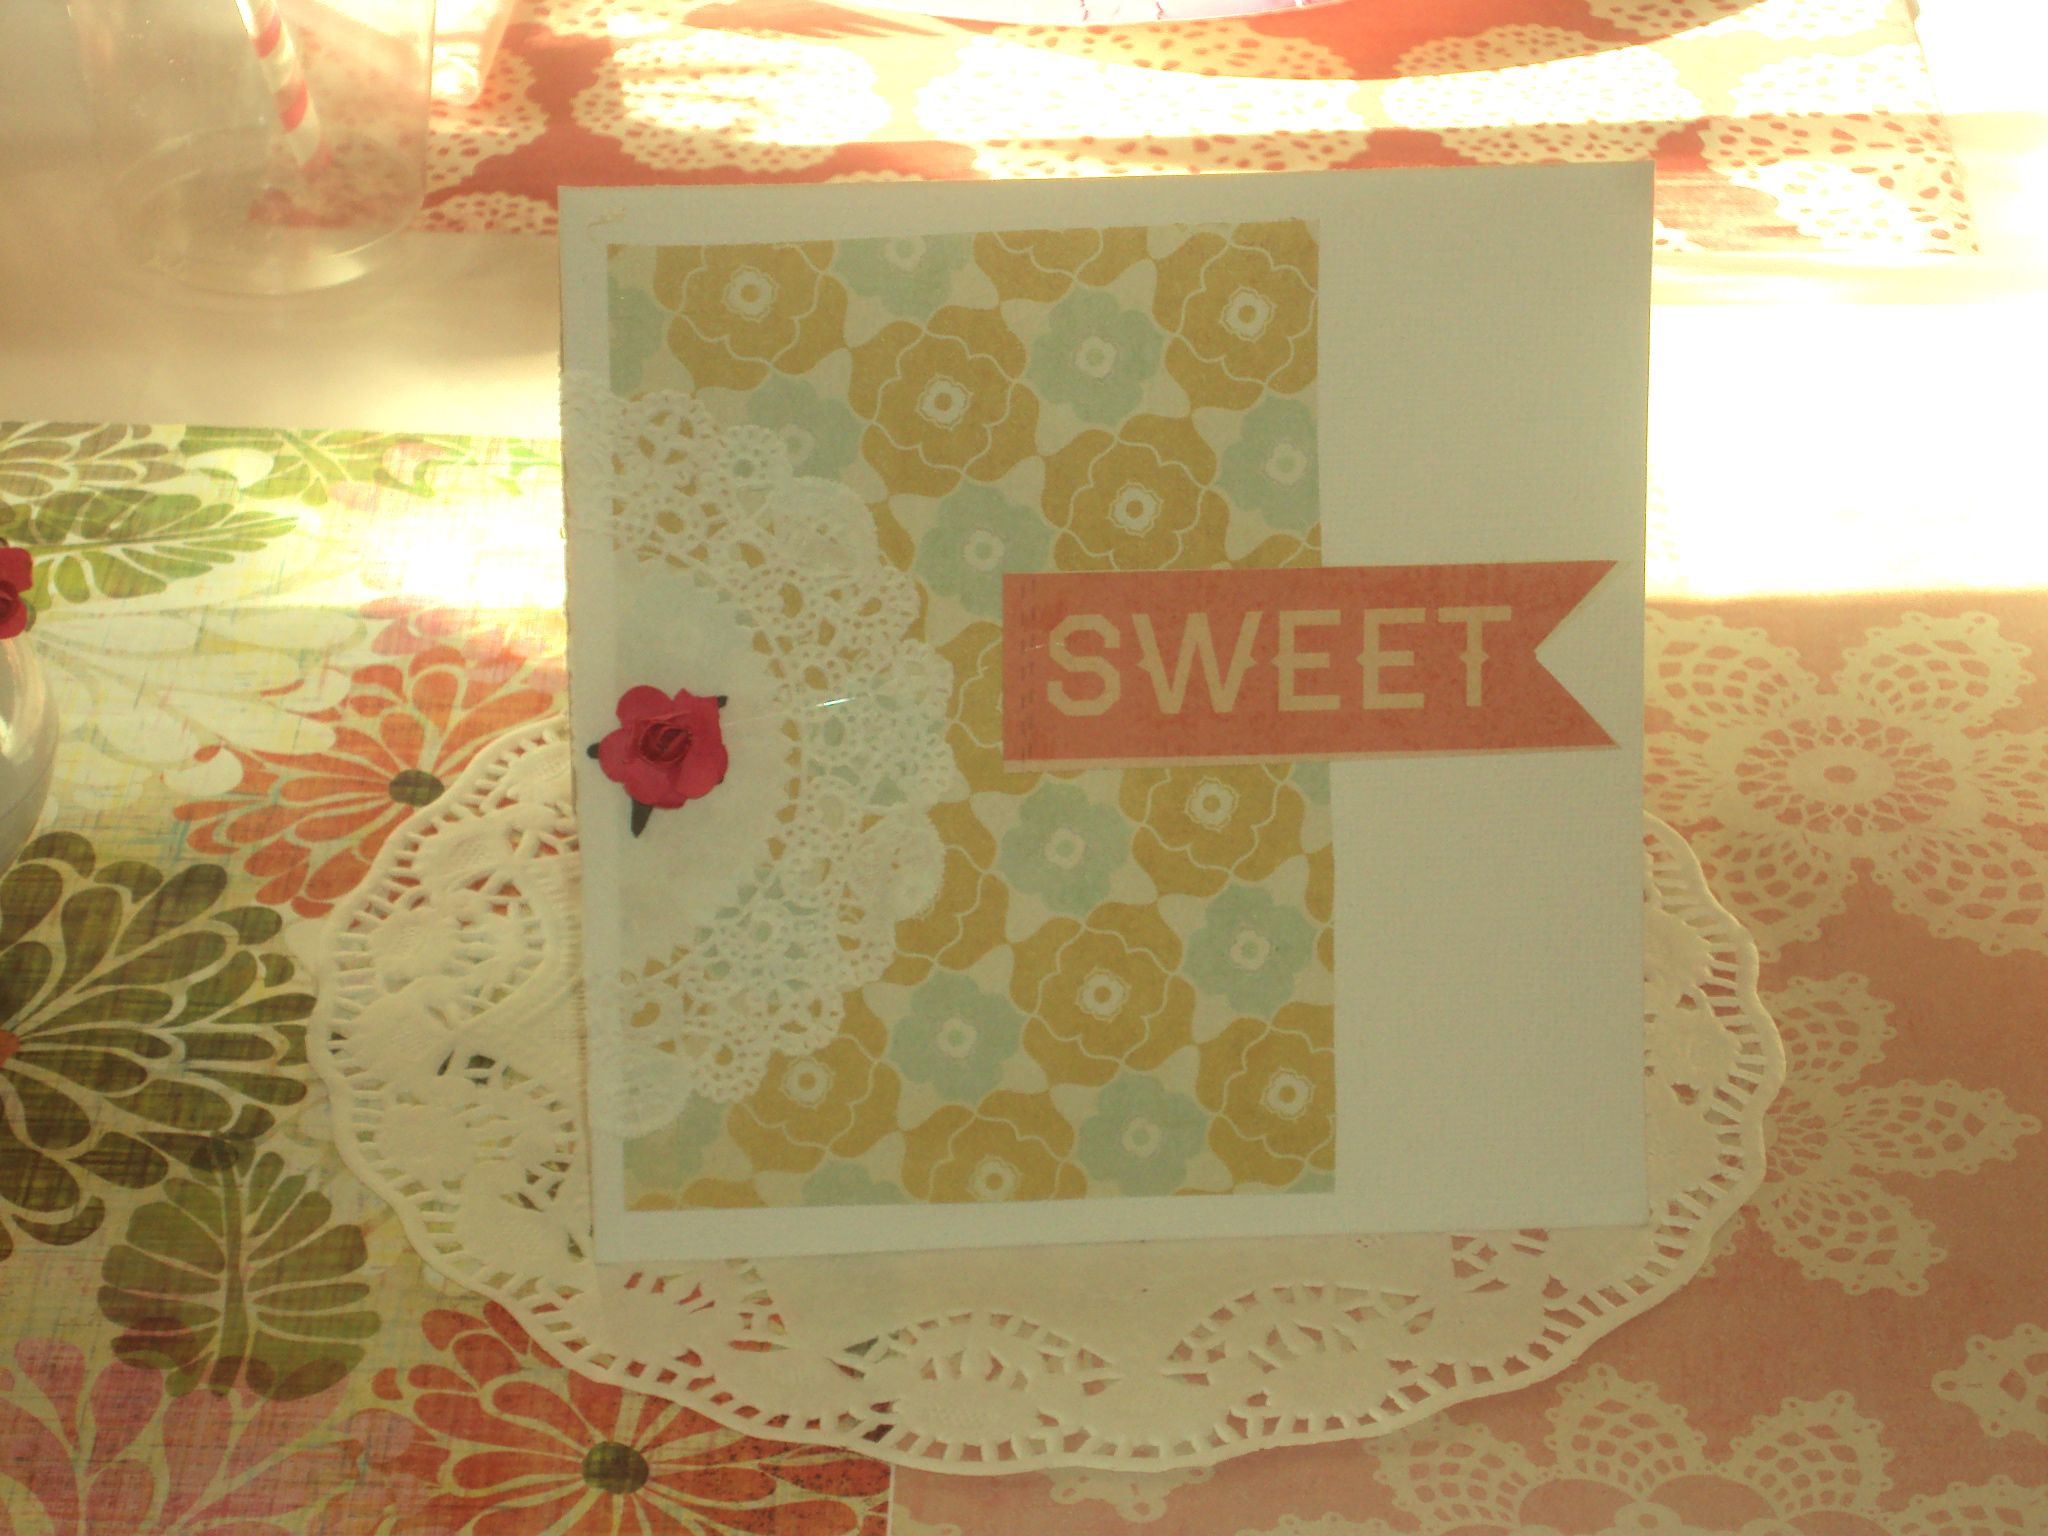 Handmade Tea Party Invitations!